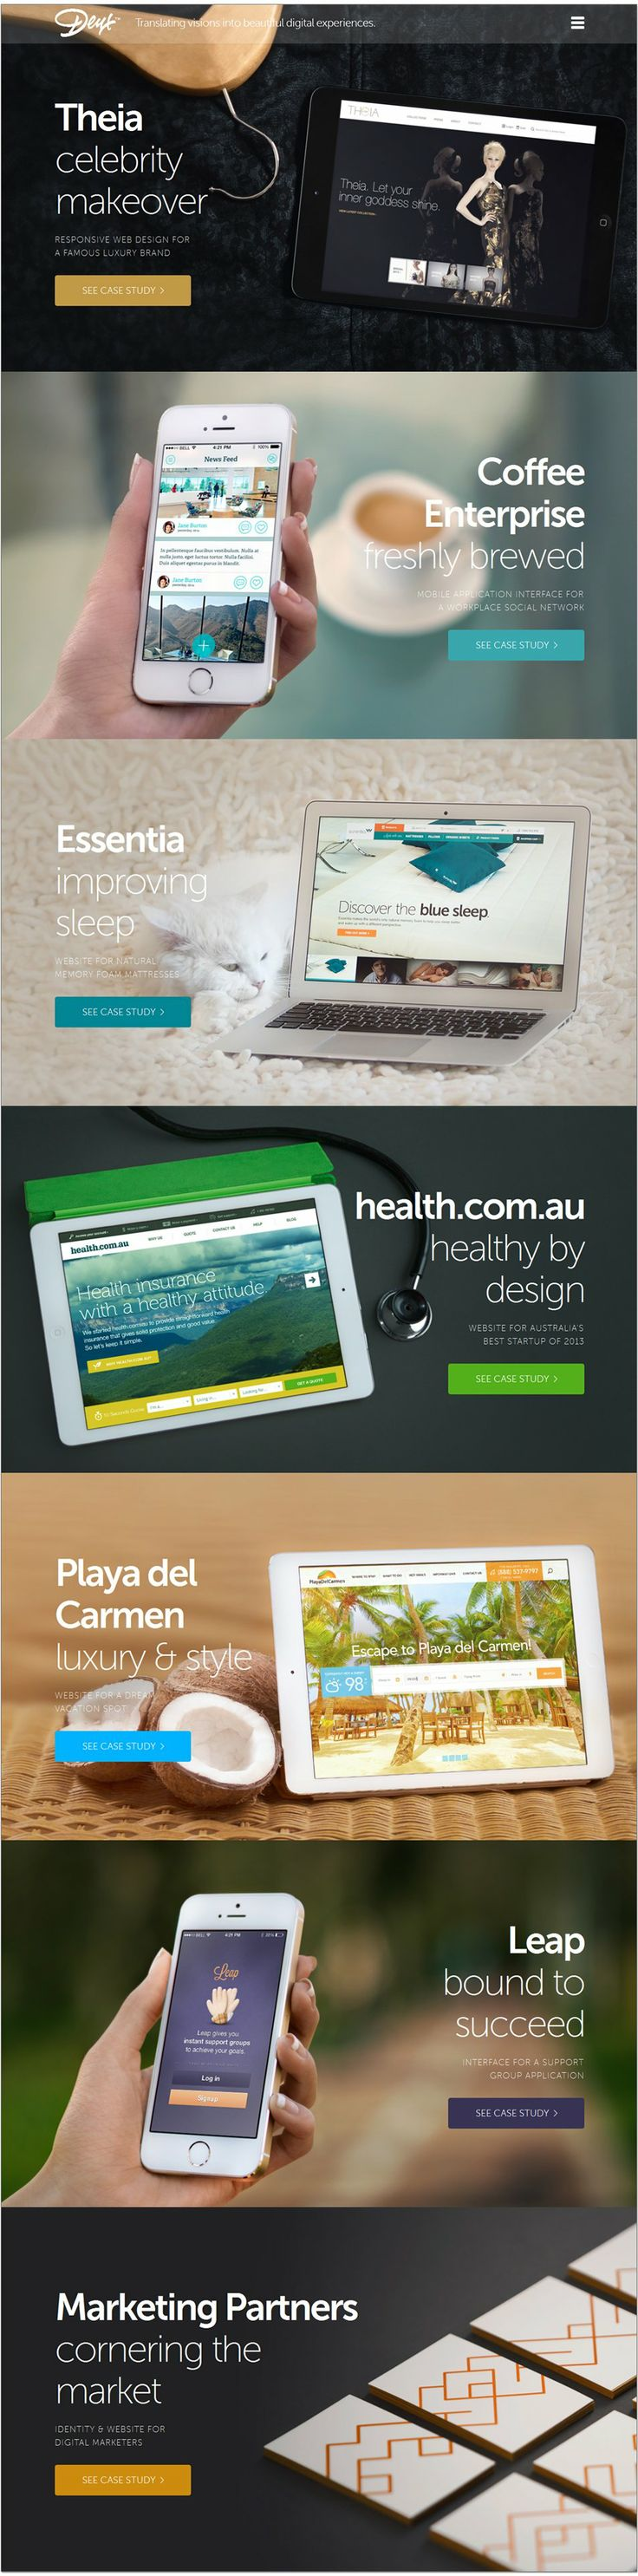 Cool Web Design on the Internet, Deux. #webdesign #webdevelopment #website @ http://www.pinterest.com/alfredchong/web-design/